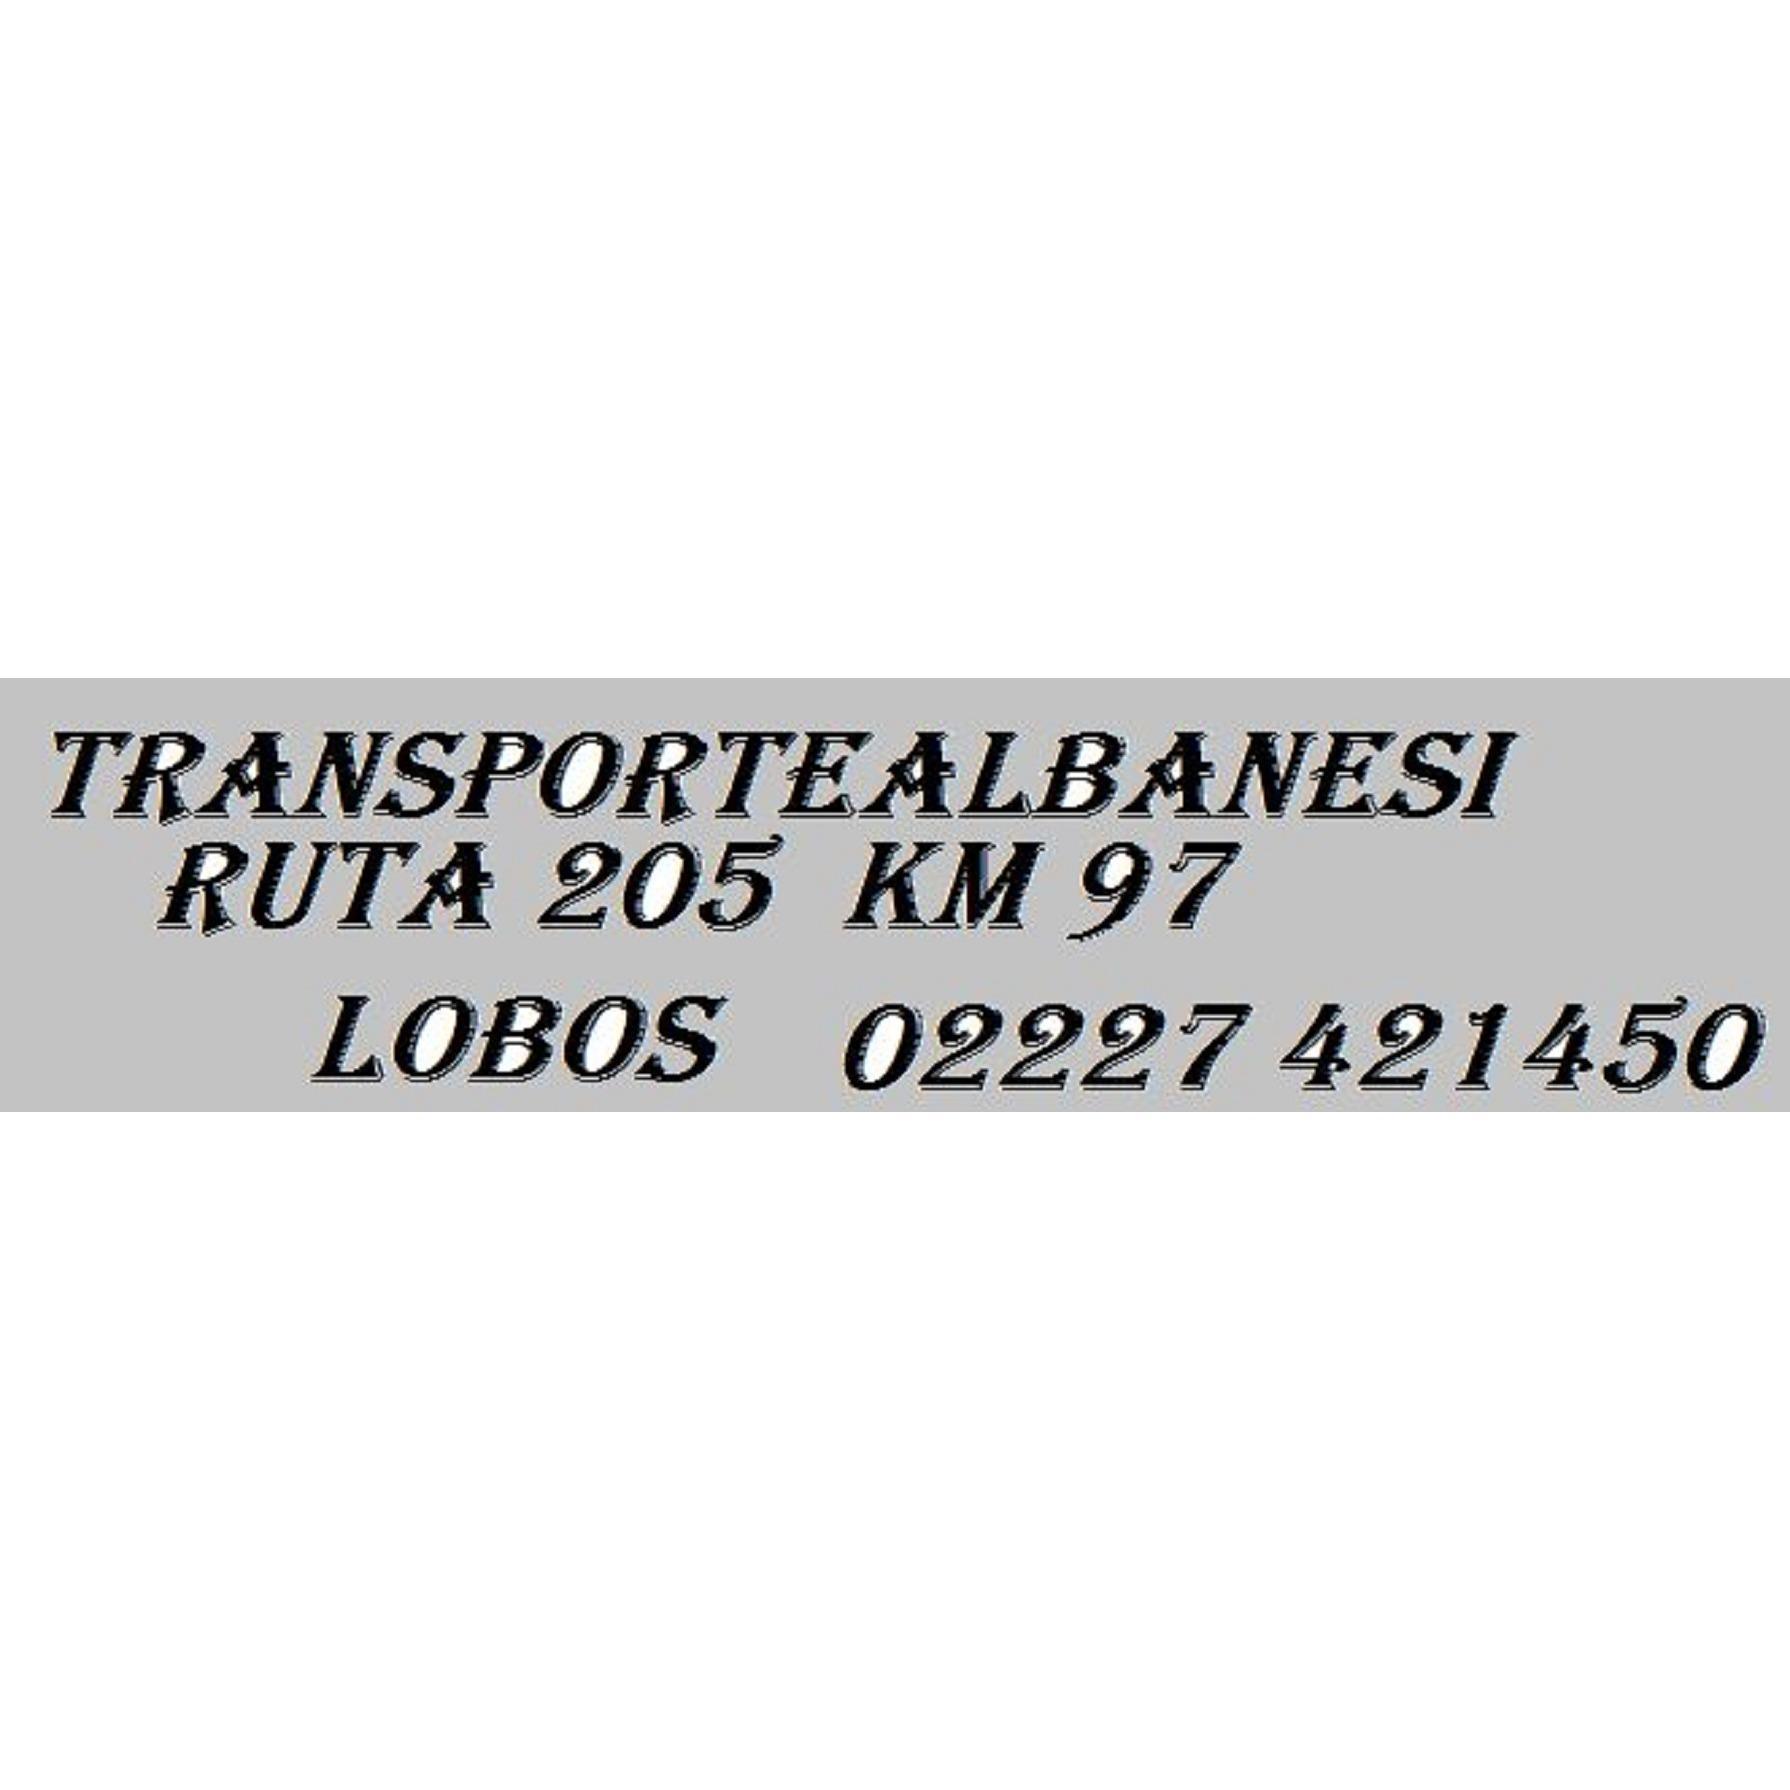 TRANSPORTE ALBANESI